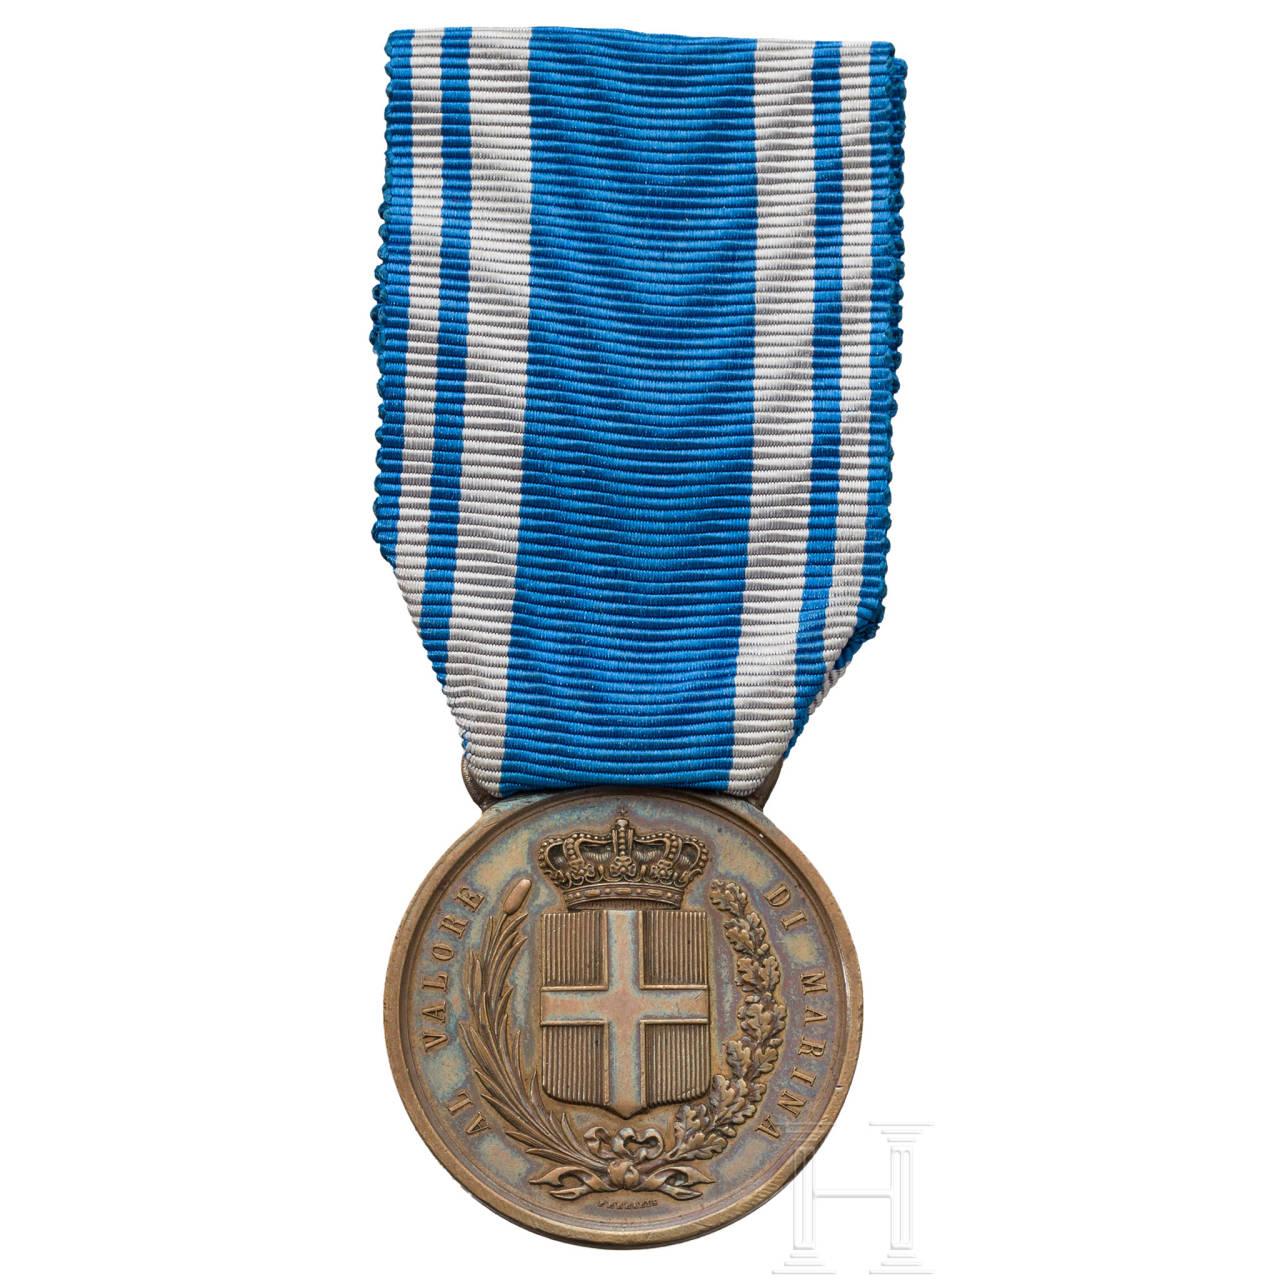 "Medaille ""Al Valore di Marina"" für Sergeant Thomas"